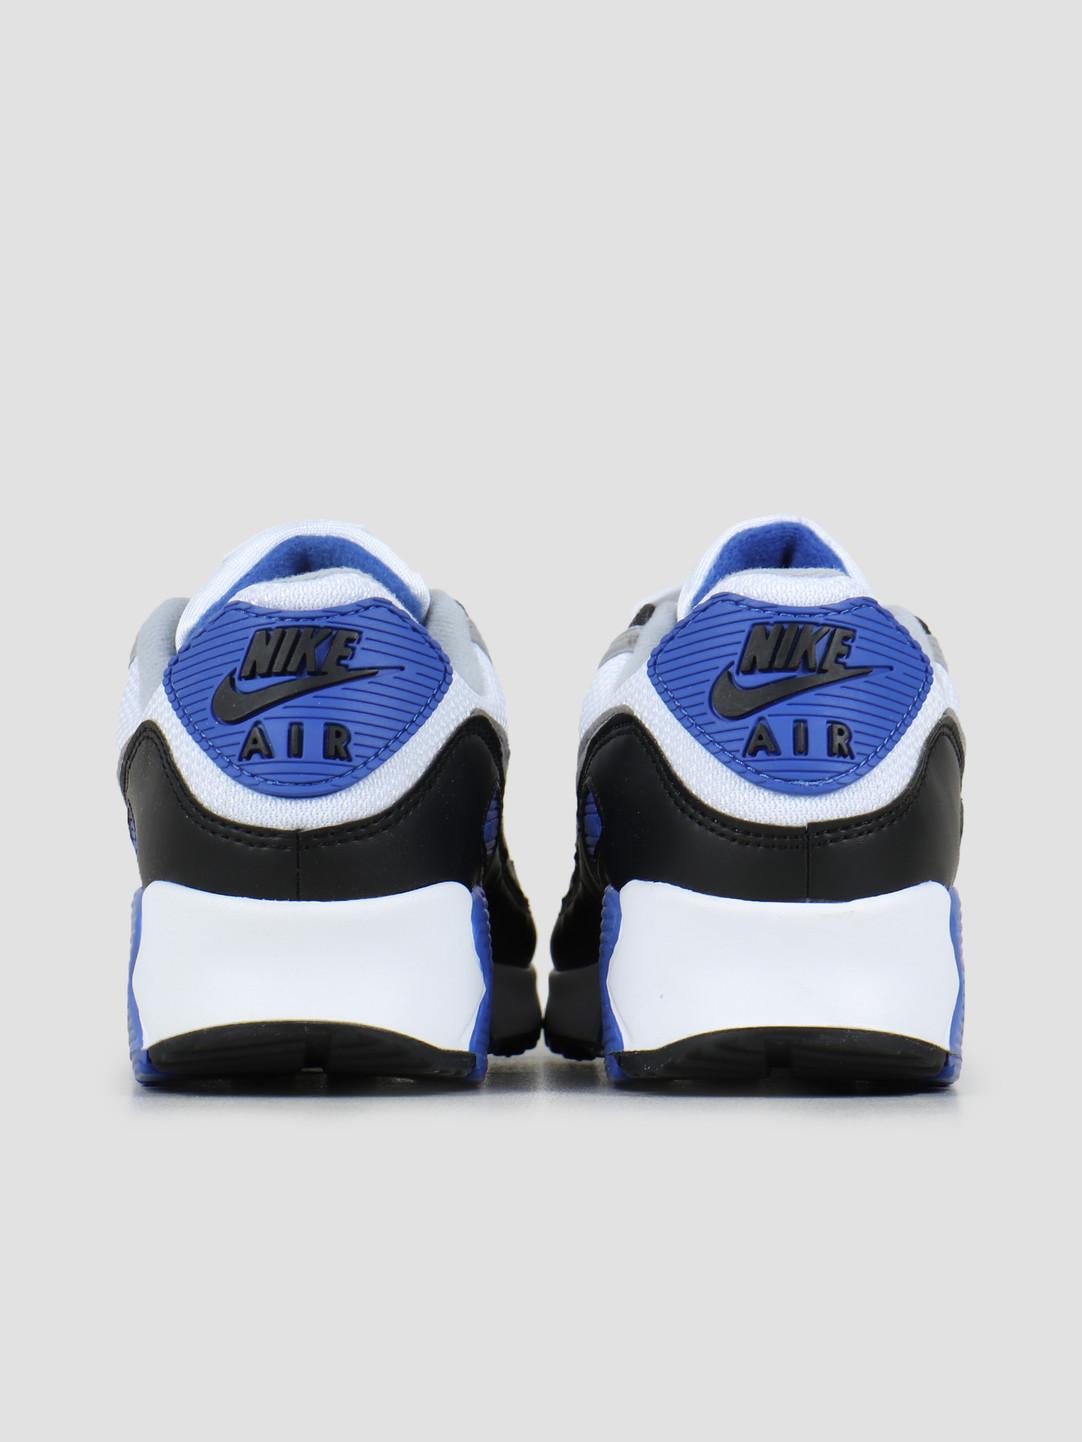 Nike Nike Air Max 90 White Particle Grey Hyper Royal Black CD0881-102